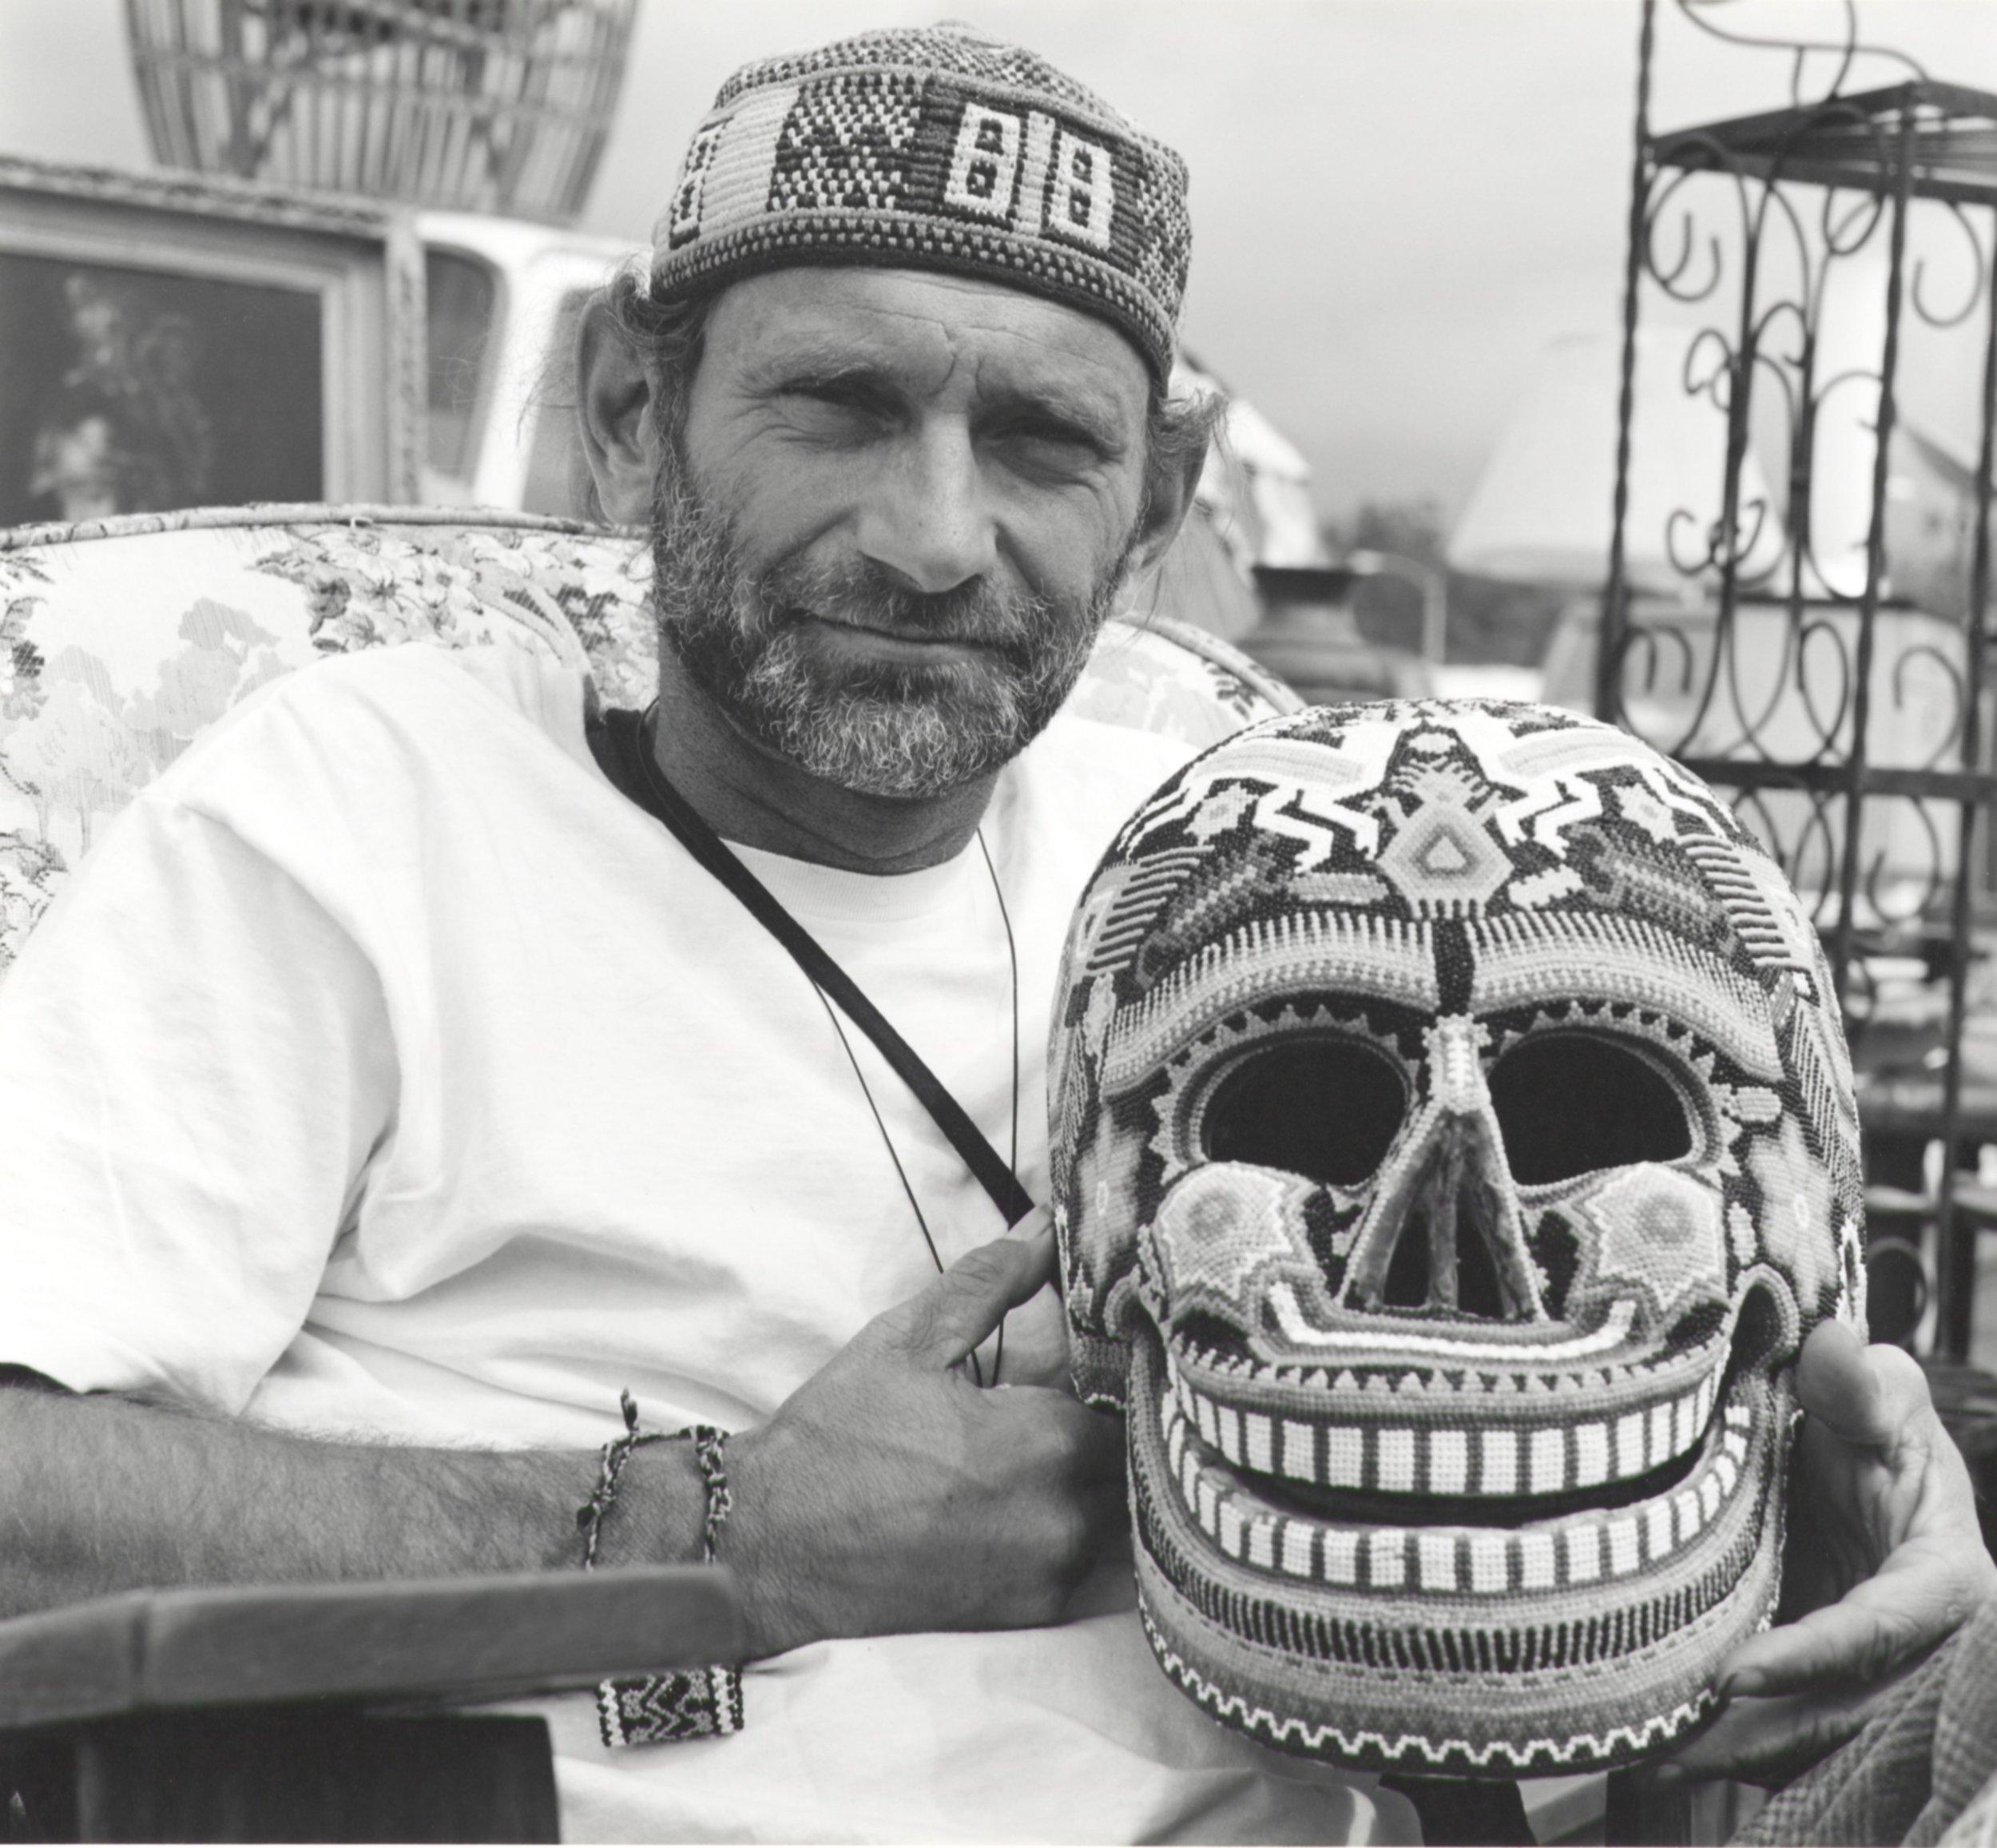 Robert With Beaded Skull - Pasadena CA 1994